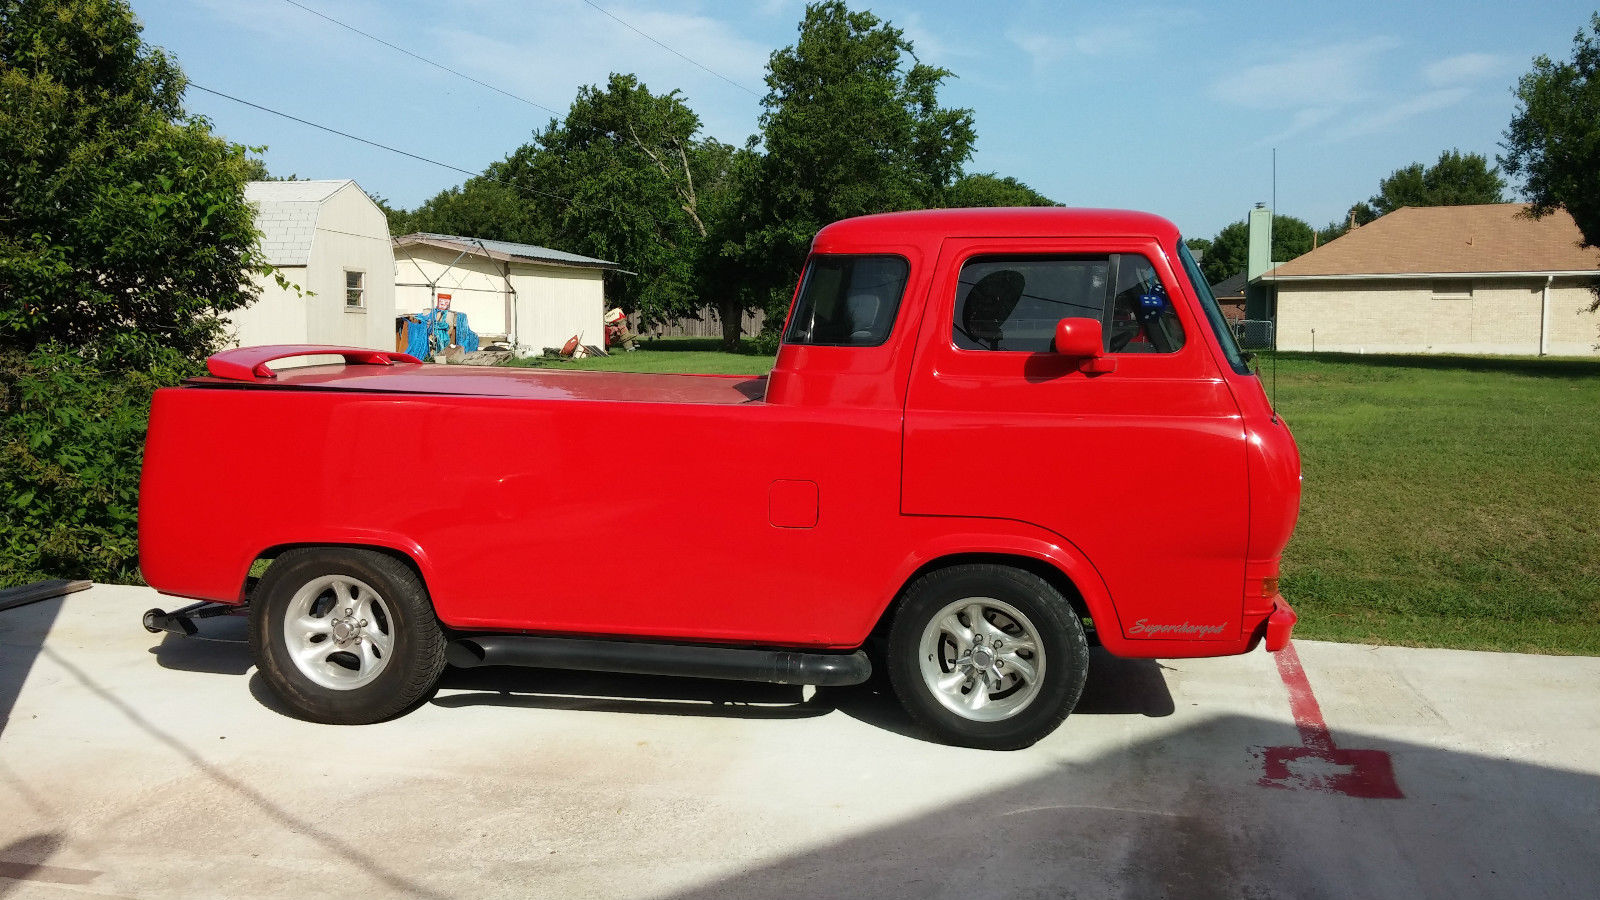 1966 ford econoline pickup for sale in pflugerville texas united states. Black Bedroom Furniture Sets. Home Design Ideas